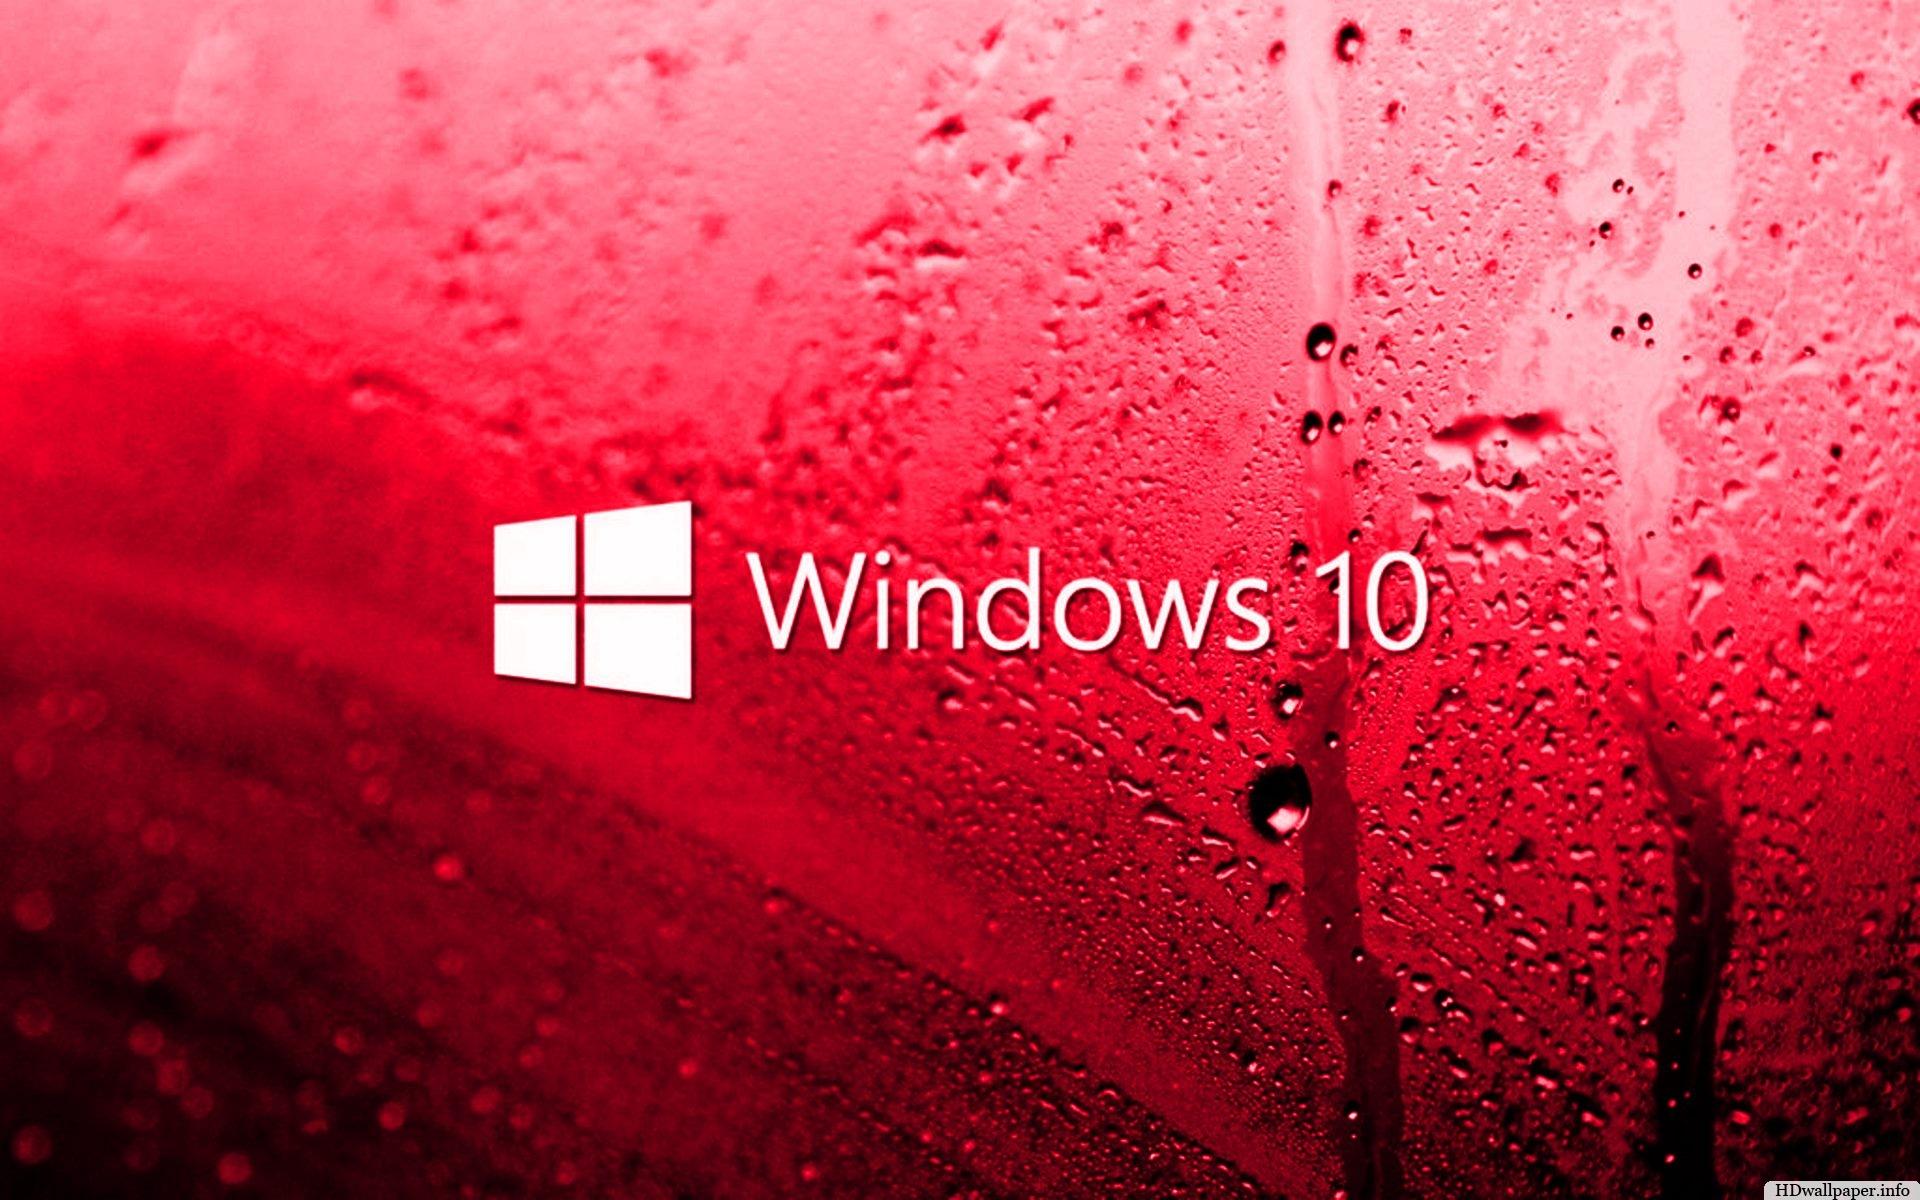 Free Windows 10 Wallpaper, Top Windows 10 HQ Images, Windows 10 WD